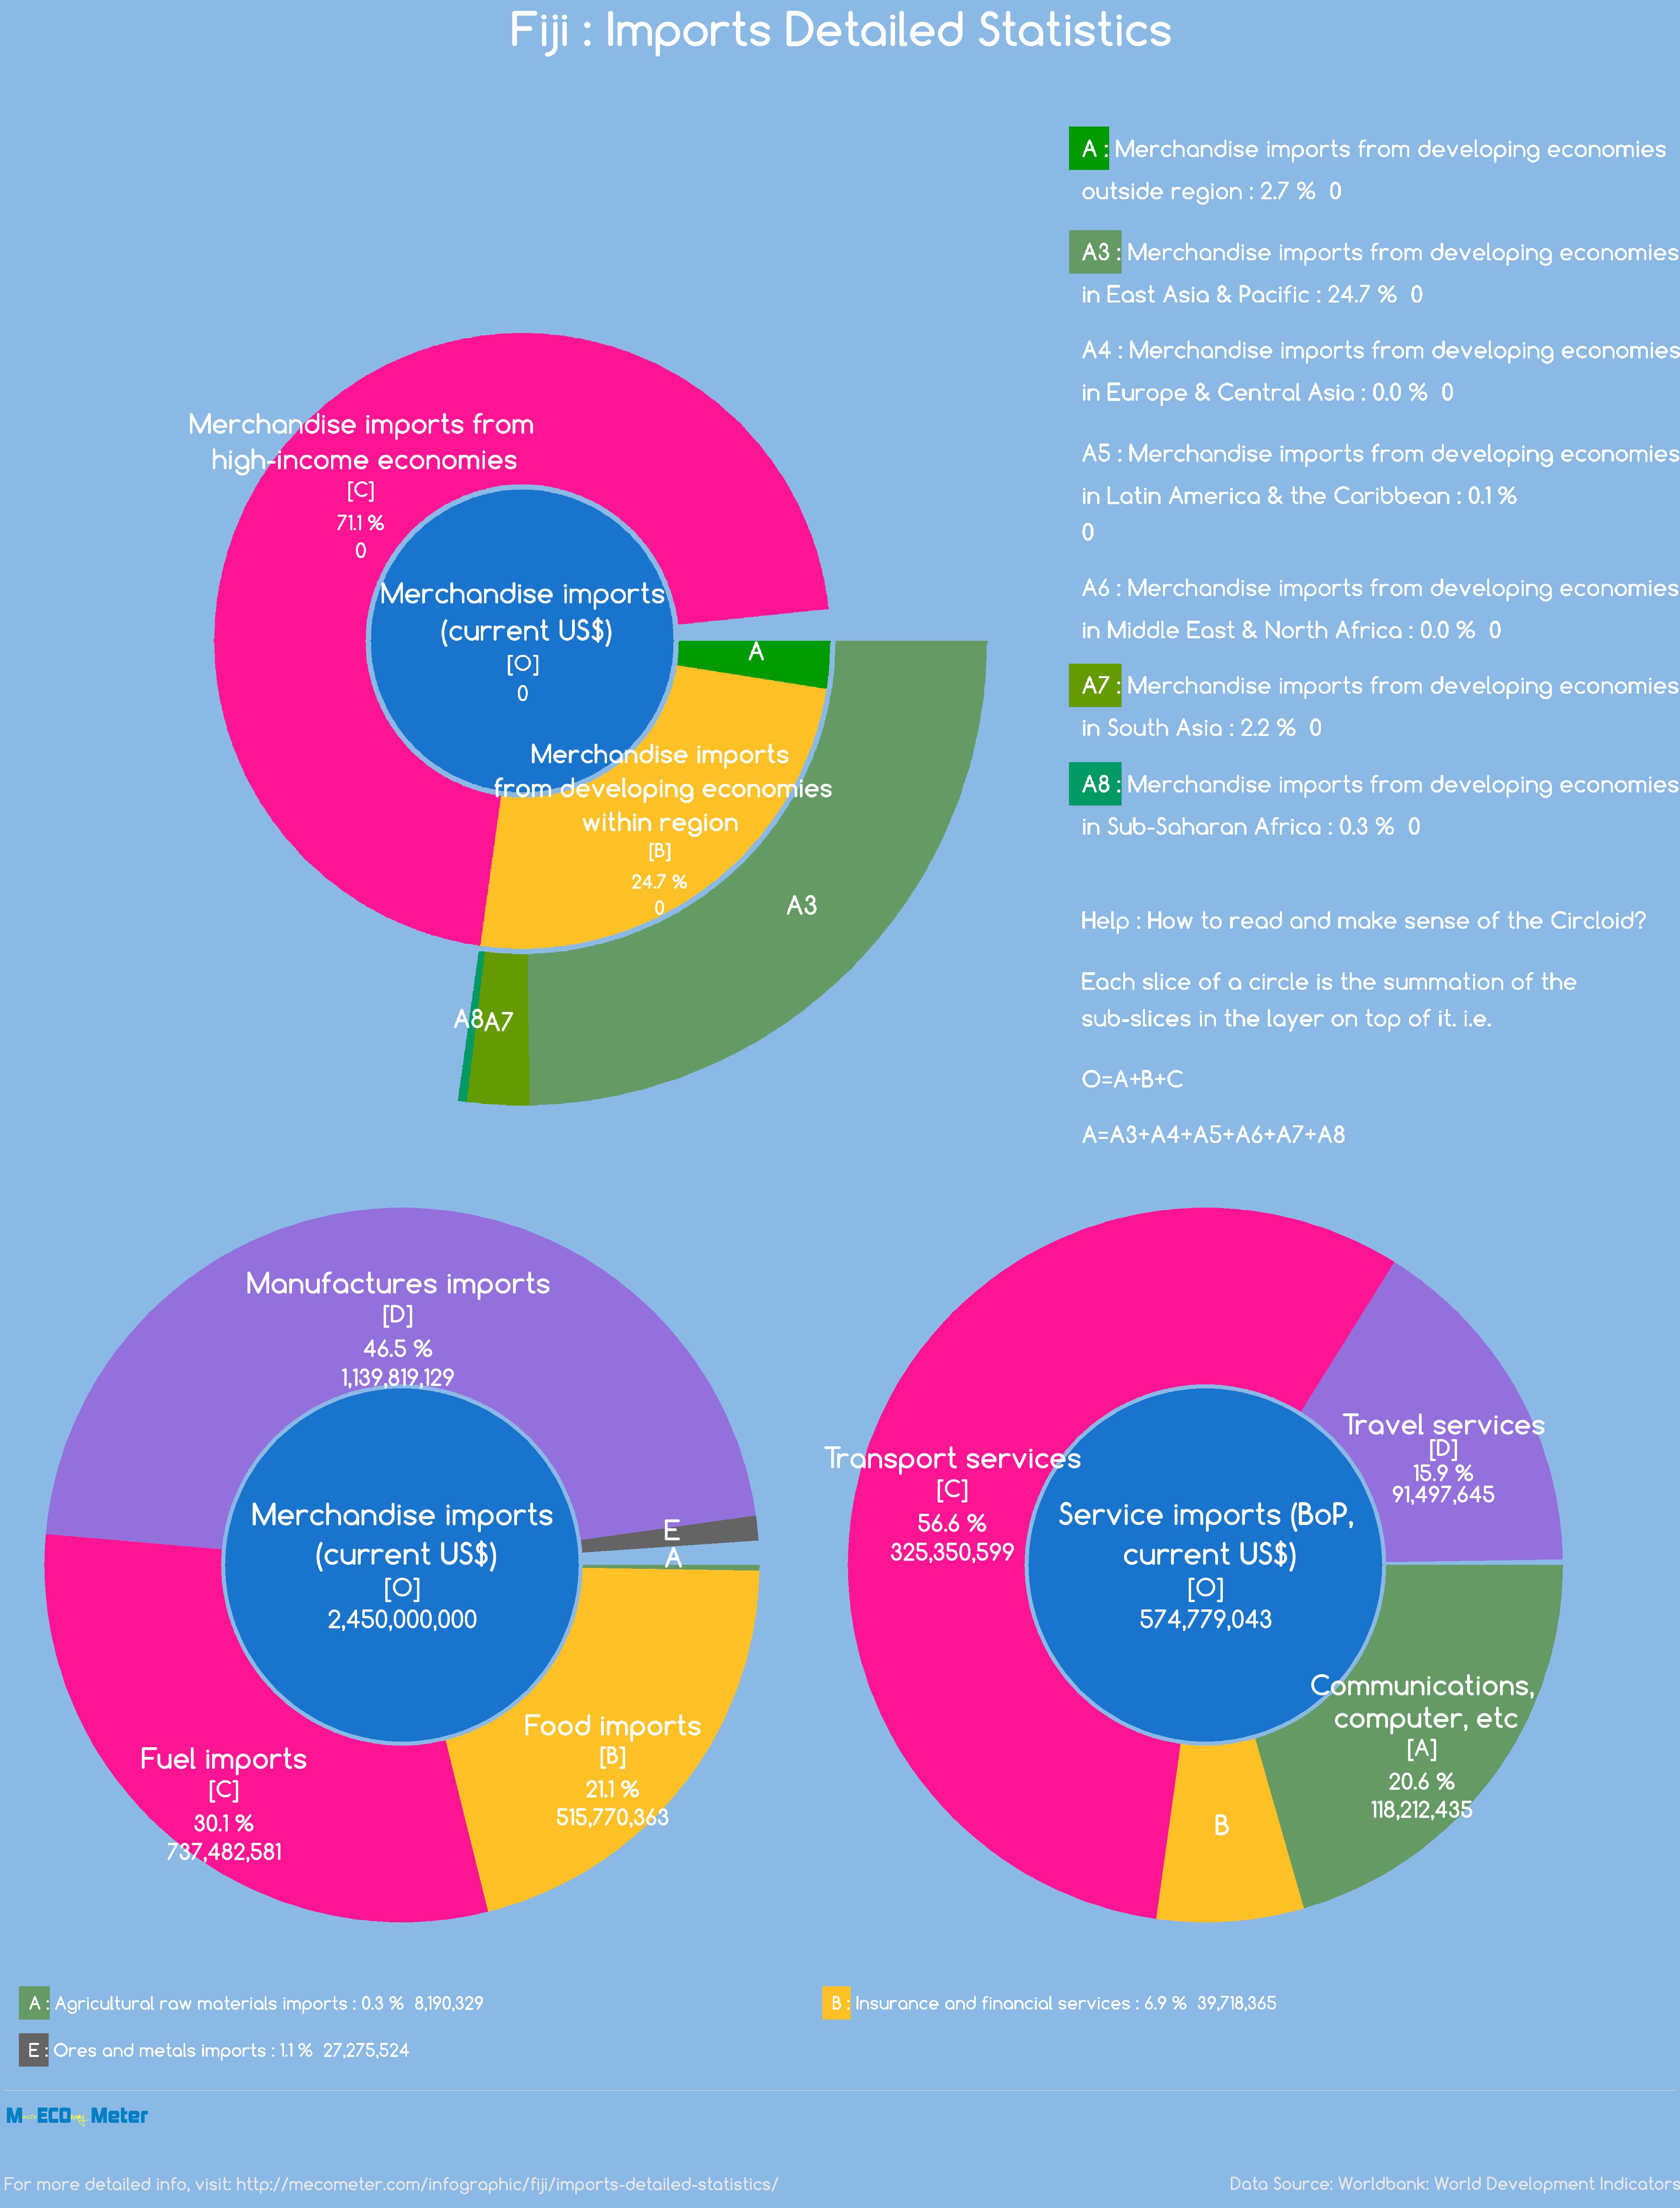 Fiji : Imports Detailed Statistics